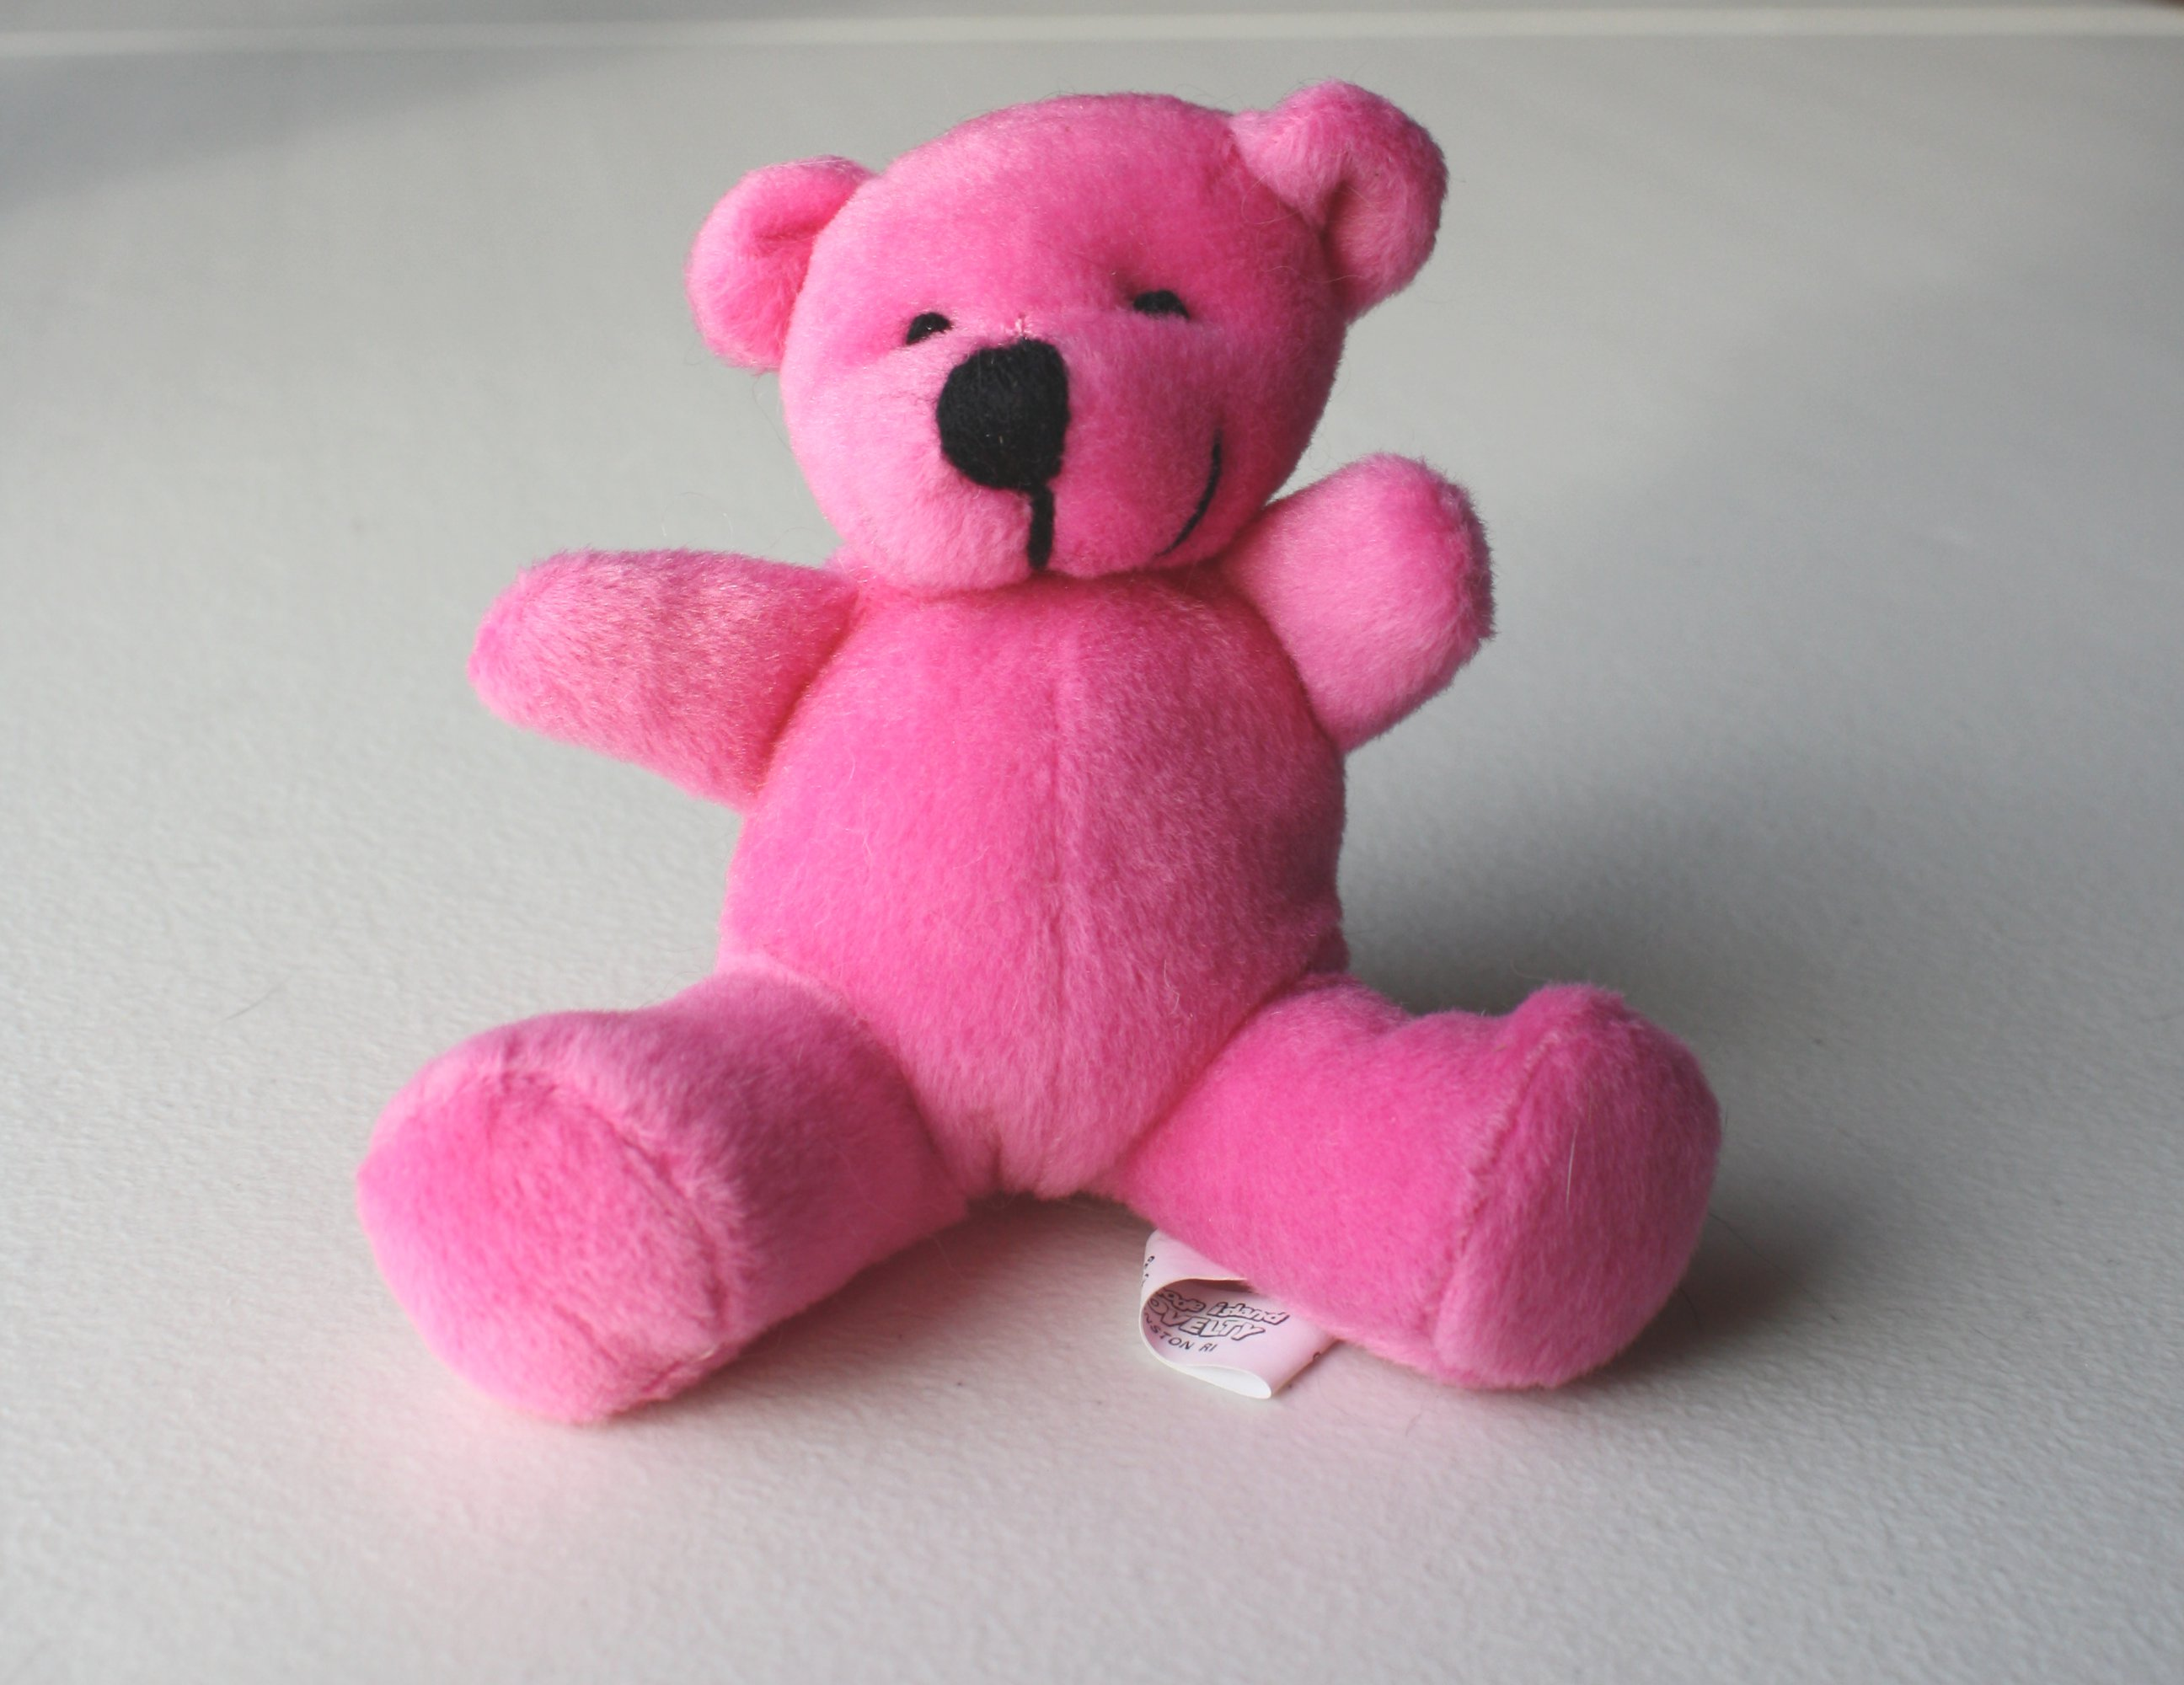 「pink bear free photo」の画像検索結果